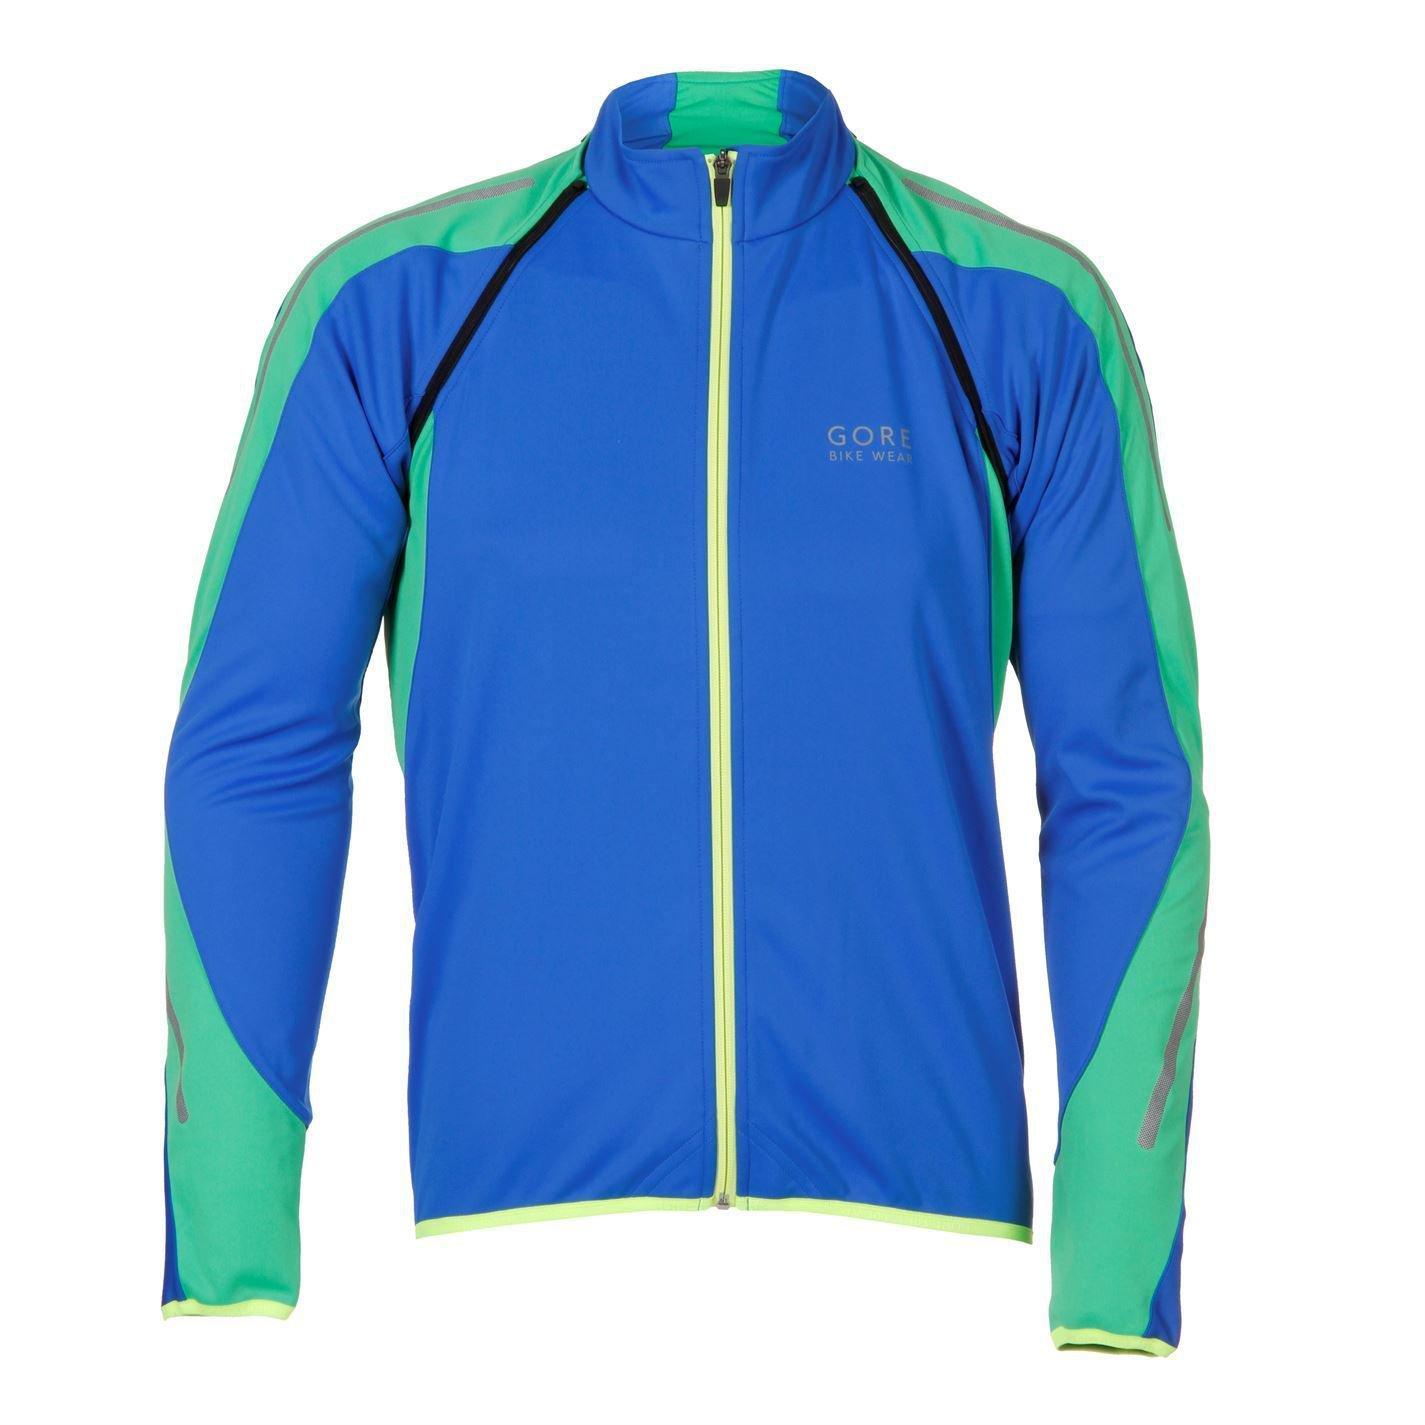 Gore Mens Gents Phantom 2 Bike Wear Jacket Outdoor Clothing New